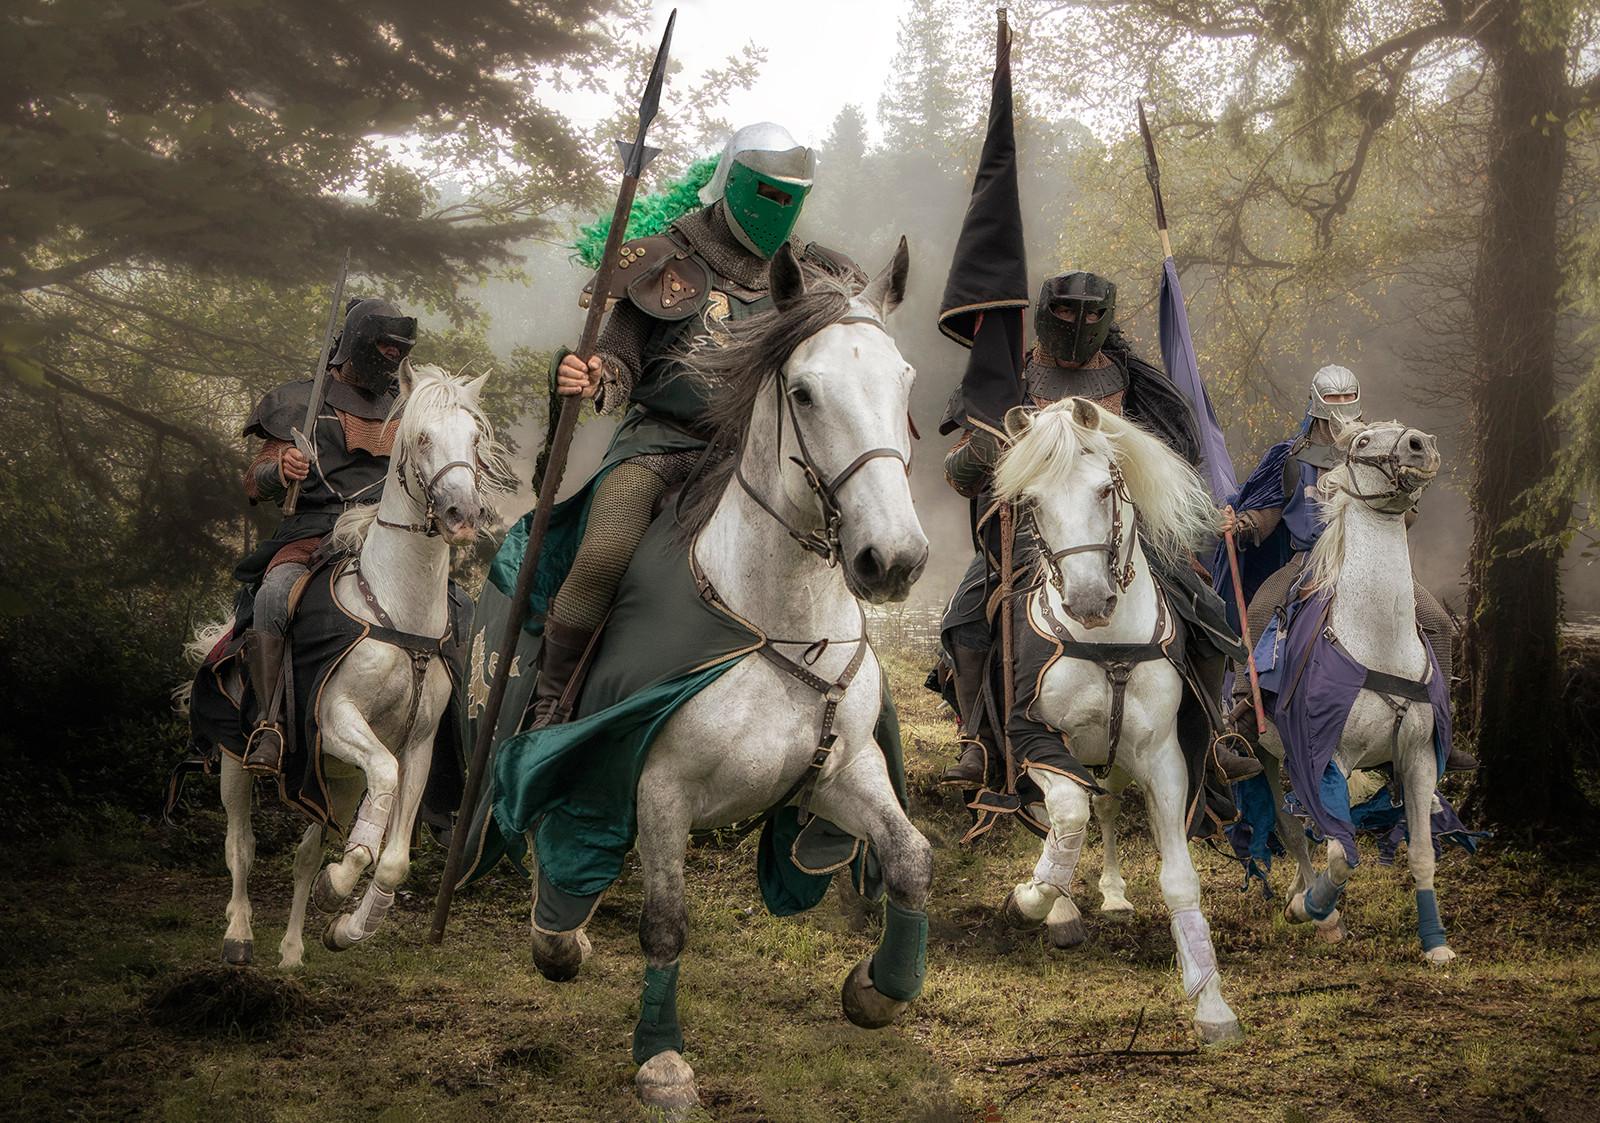 COLOUR - The Four Horsemen by Alan Field (10 marks)